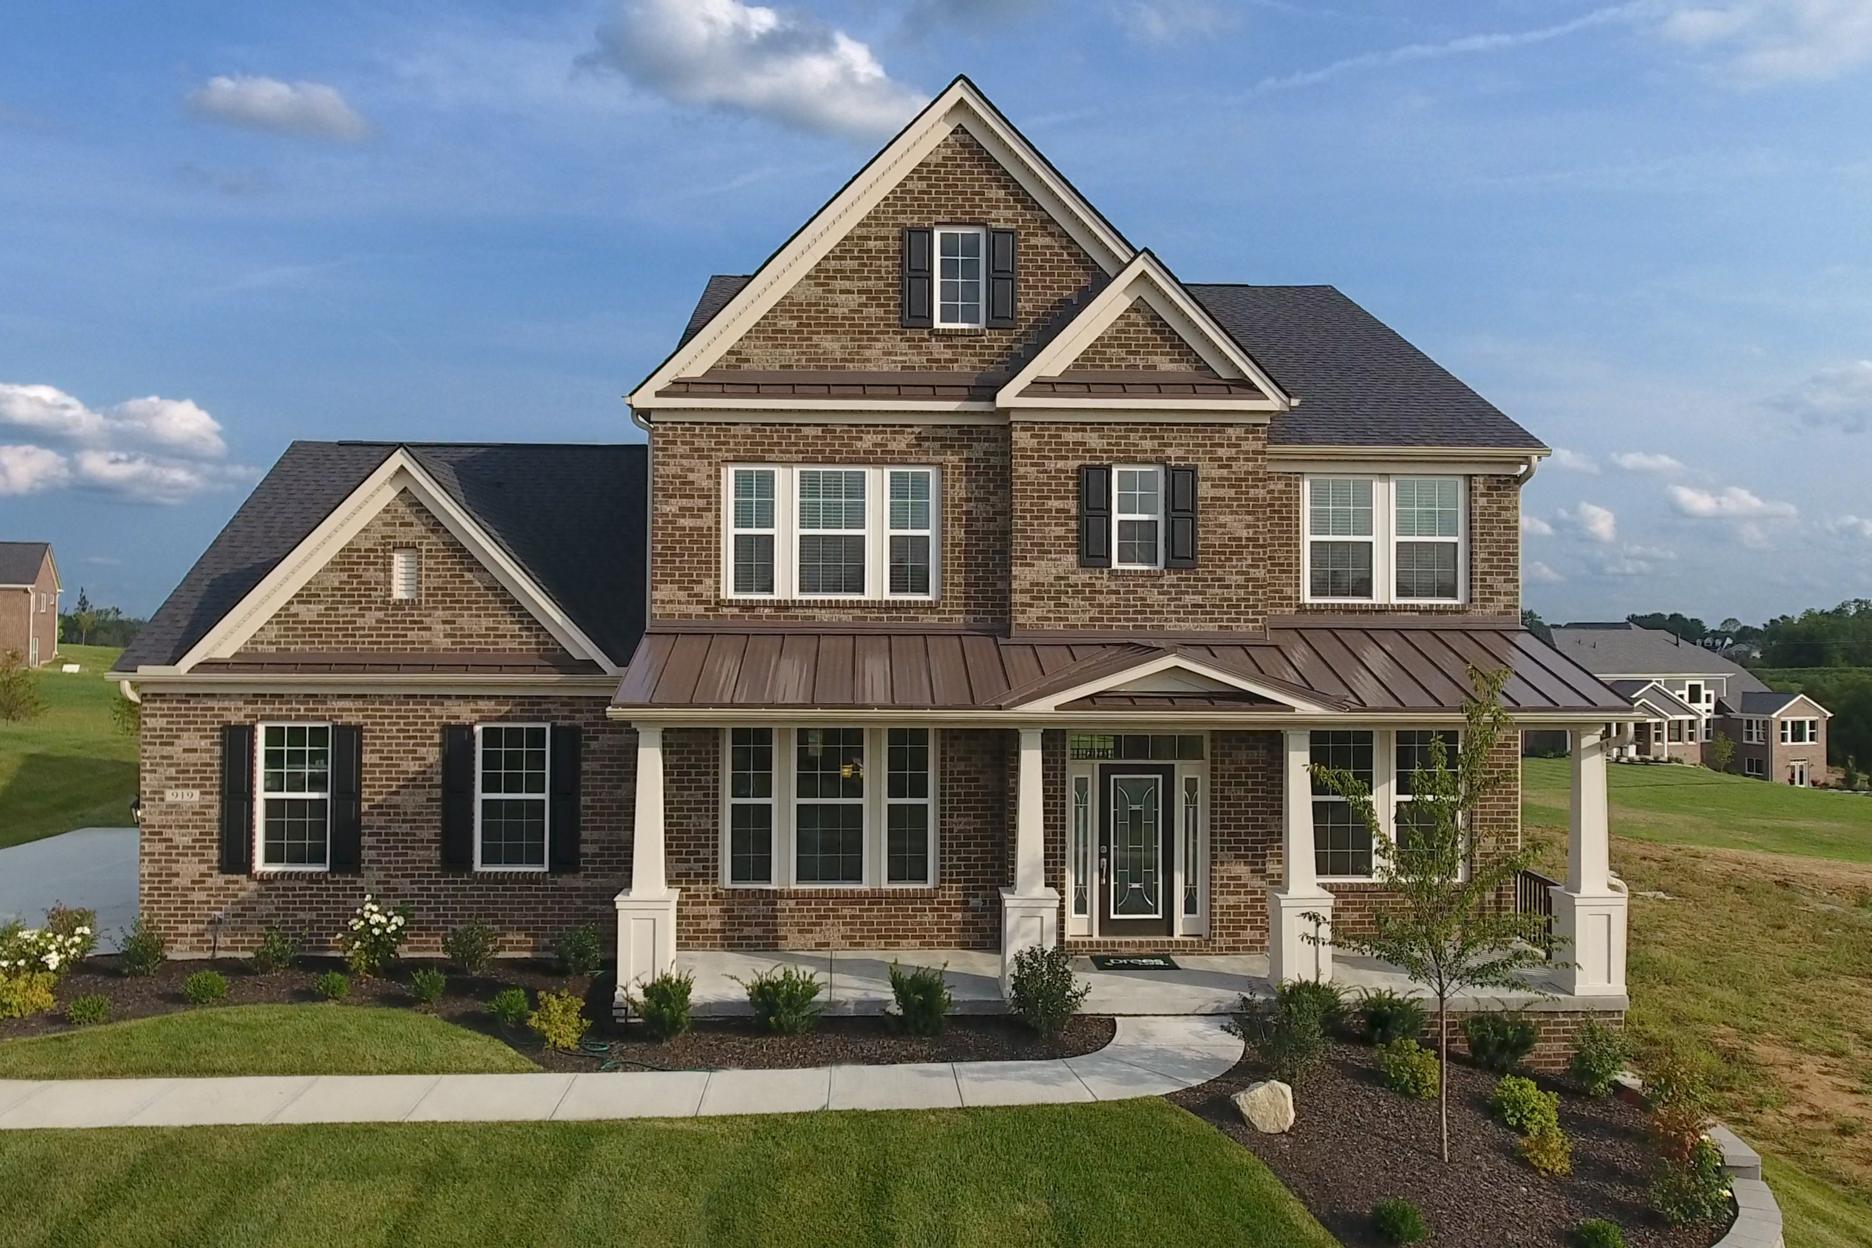 Single Family for Sale at Pembroke 919 Man O' War Boulevard Union, Kentucky 41091 United States